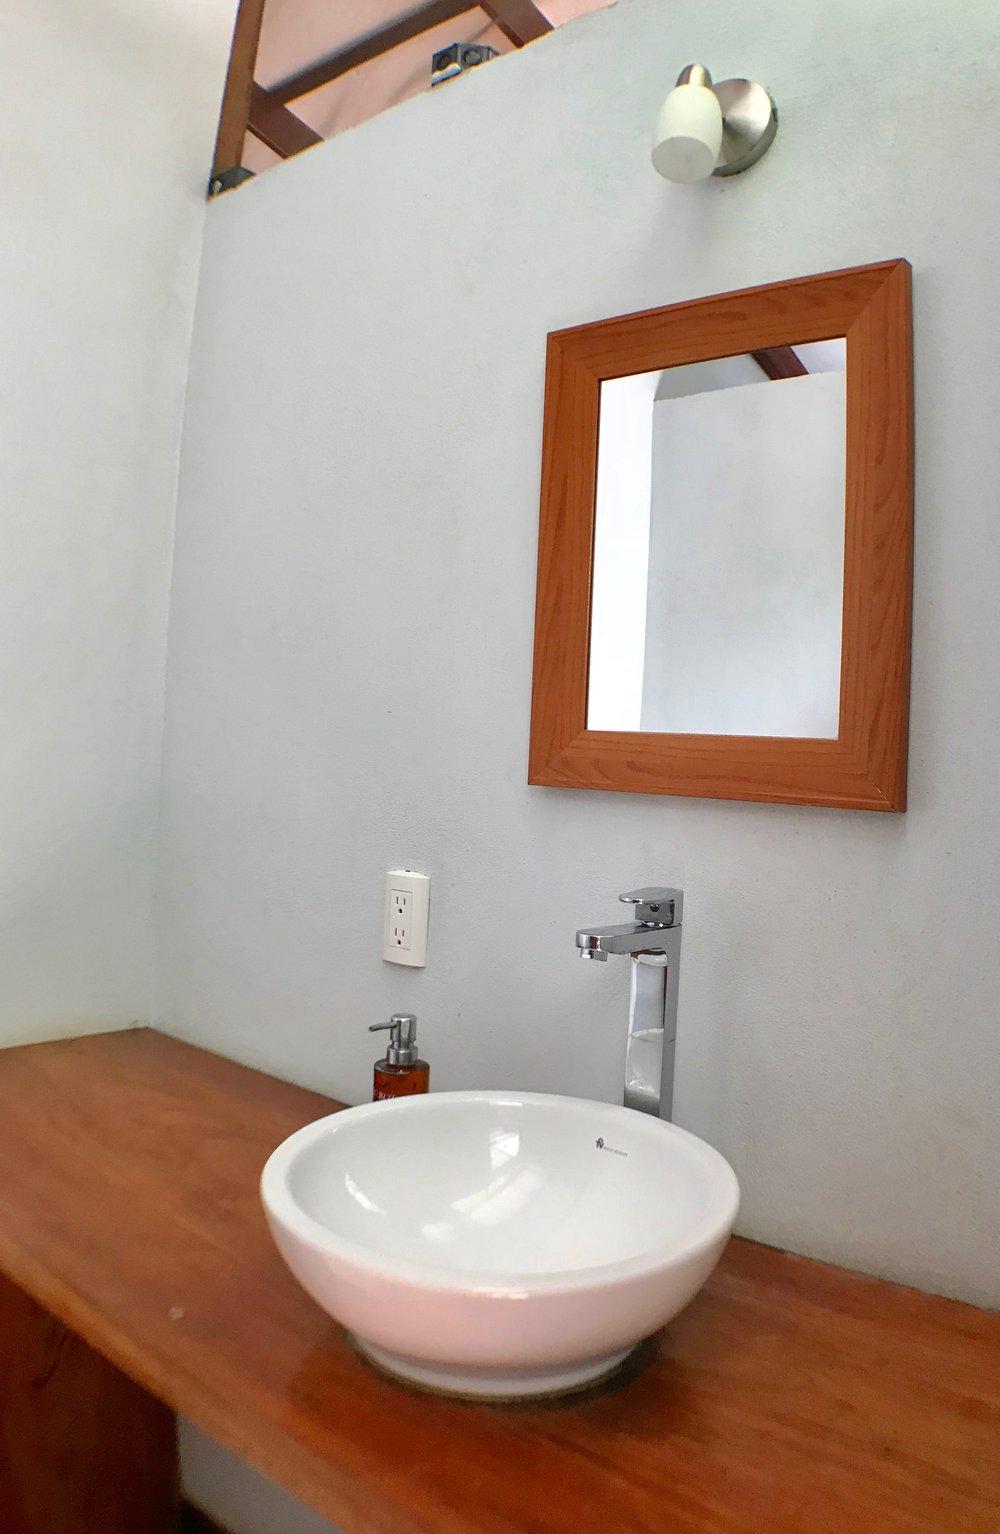 SD Bathroom Sink.jpg